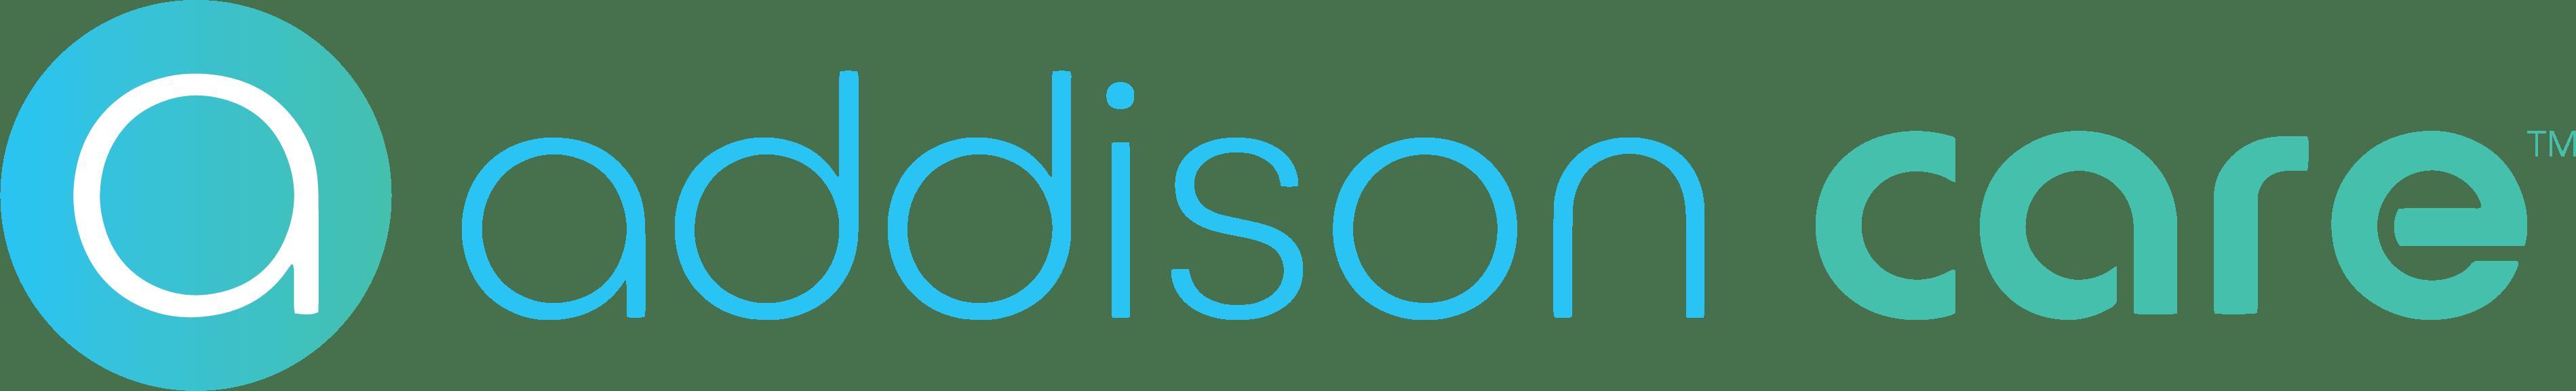 Addison Care Logo